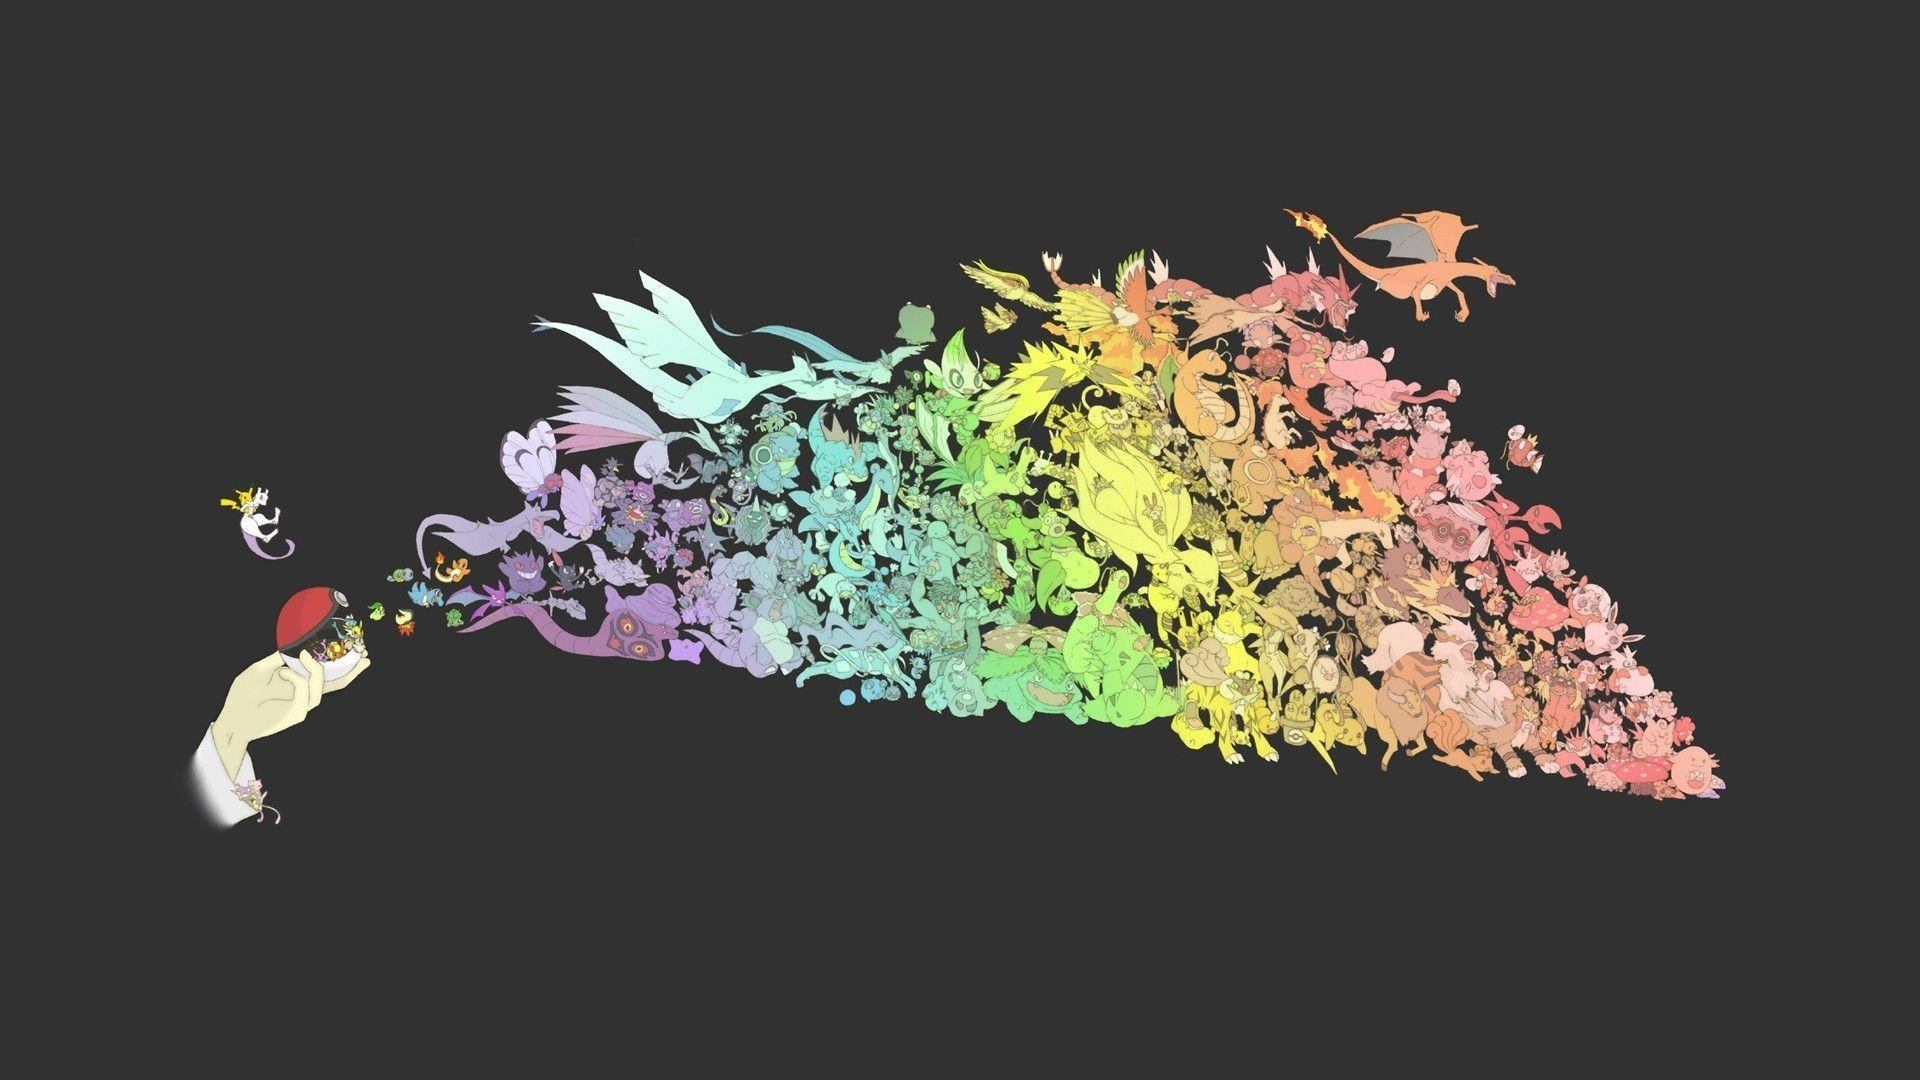 Epic Pokemon Wallpapers 1920x1080